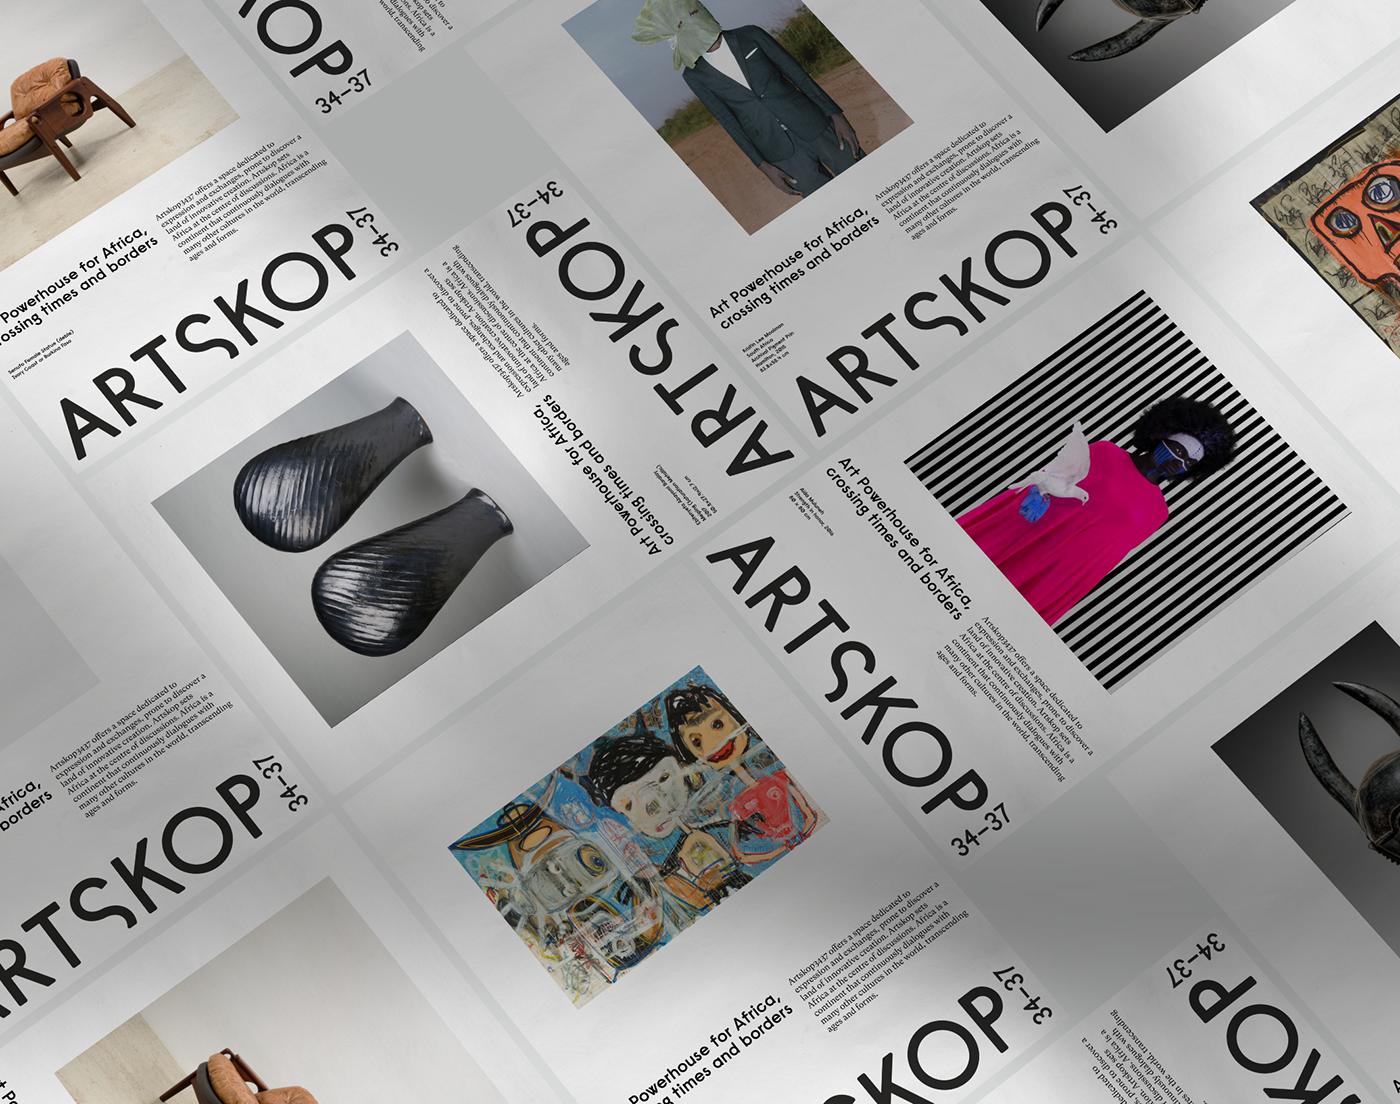 art africa media magazine contemporary art culture cultural Paris